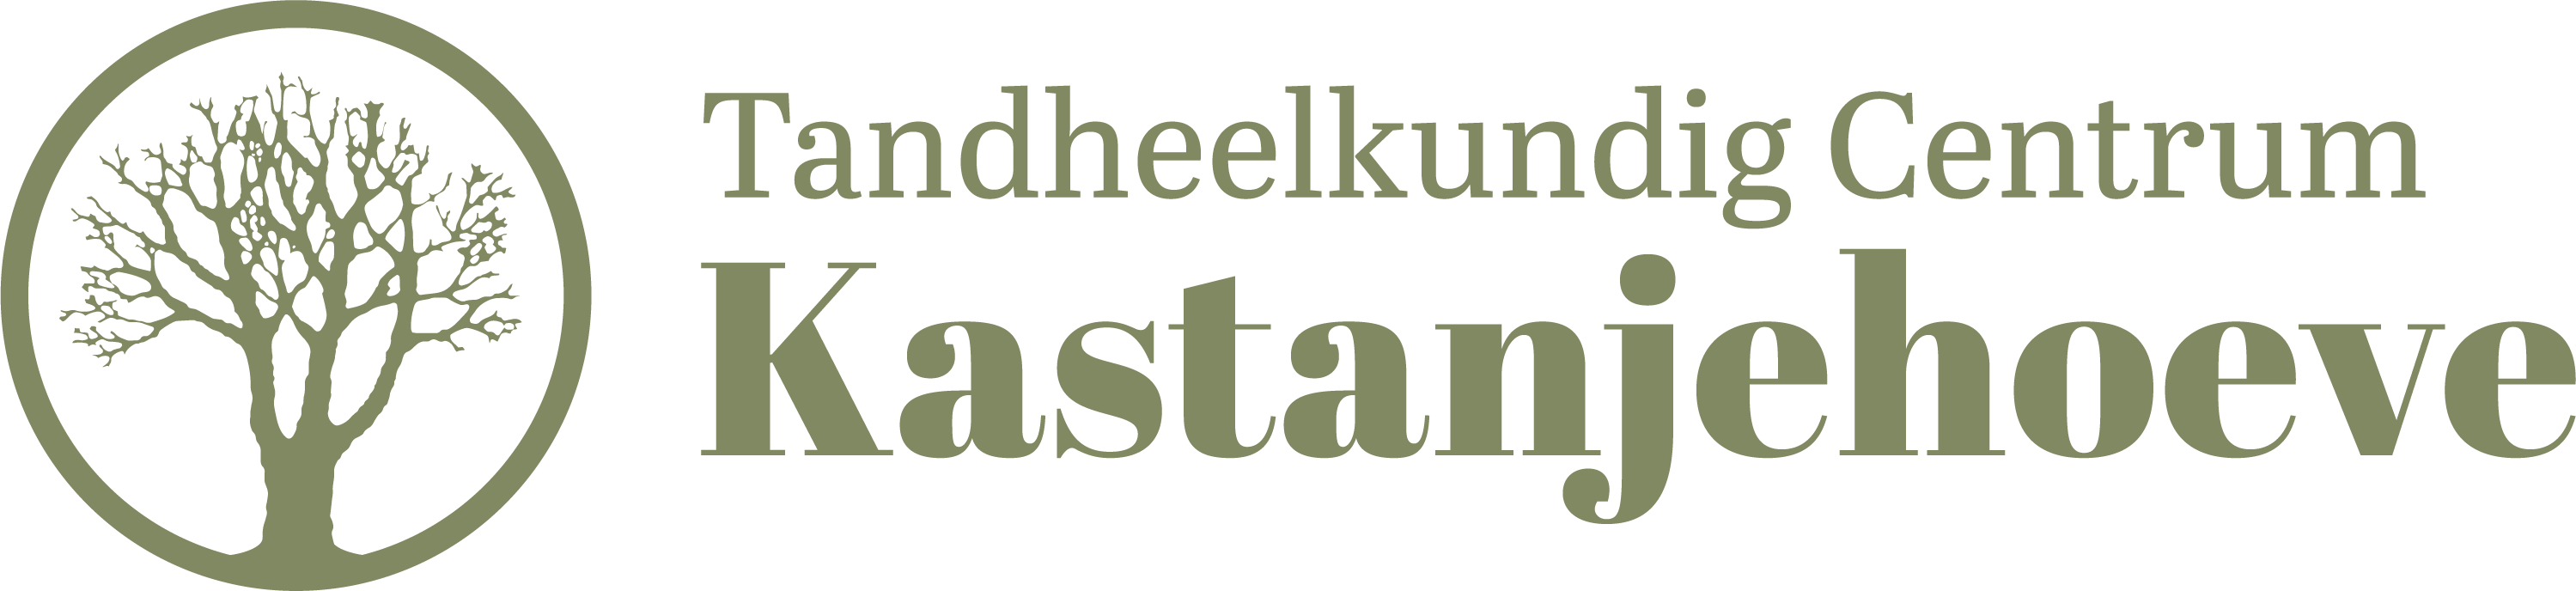 Tandheelkundig Centrum Kastanjehoeve